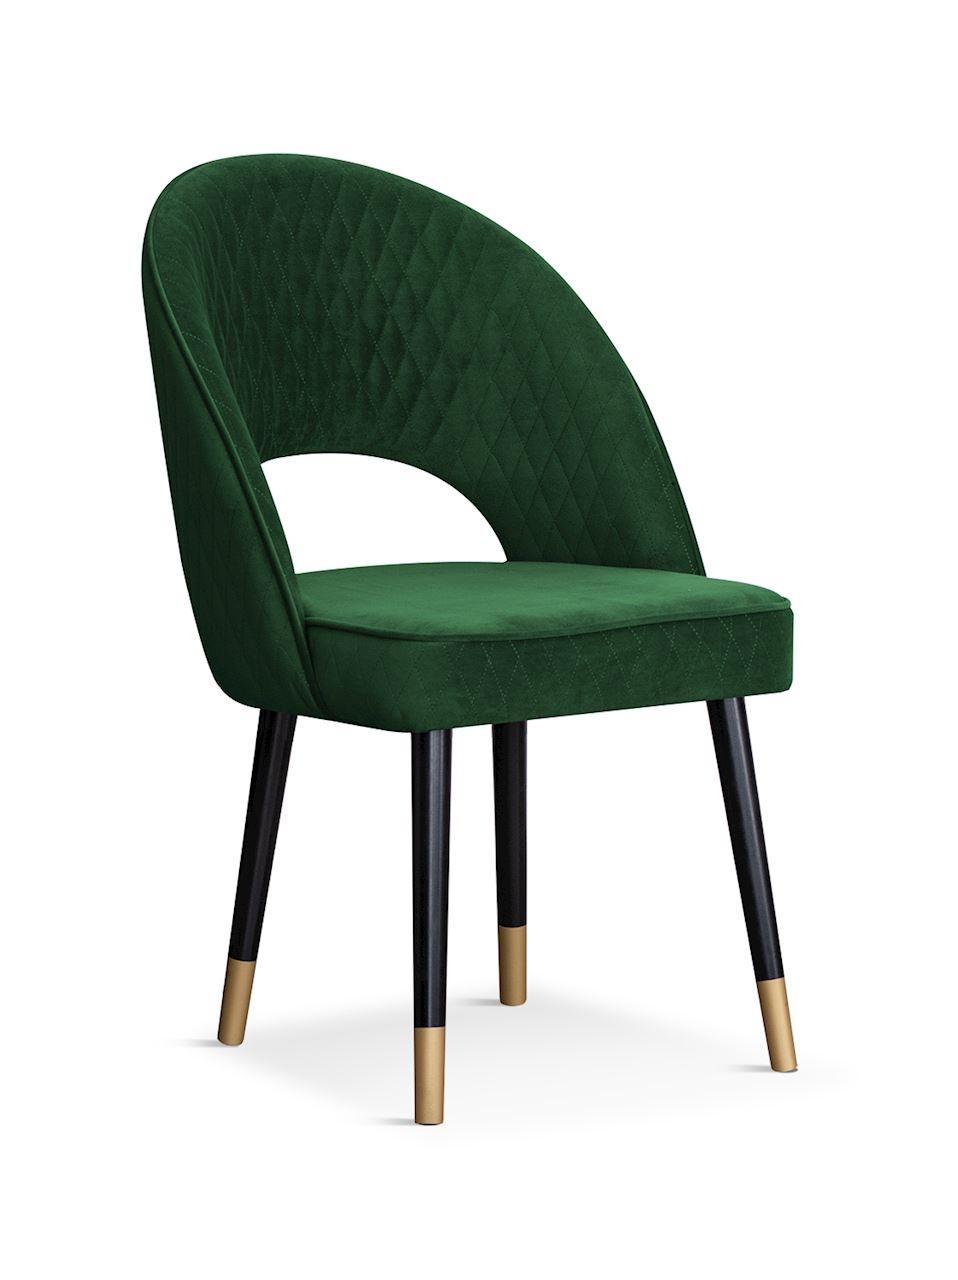 Scaun tapitat cu stofa, cu picioare din lemn Ponte Green / Black / Gold, l56xA63xH89 cm